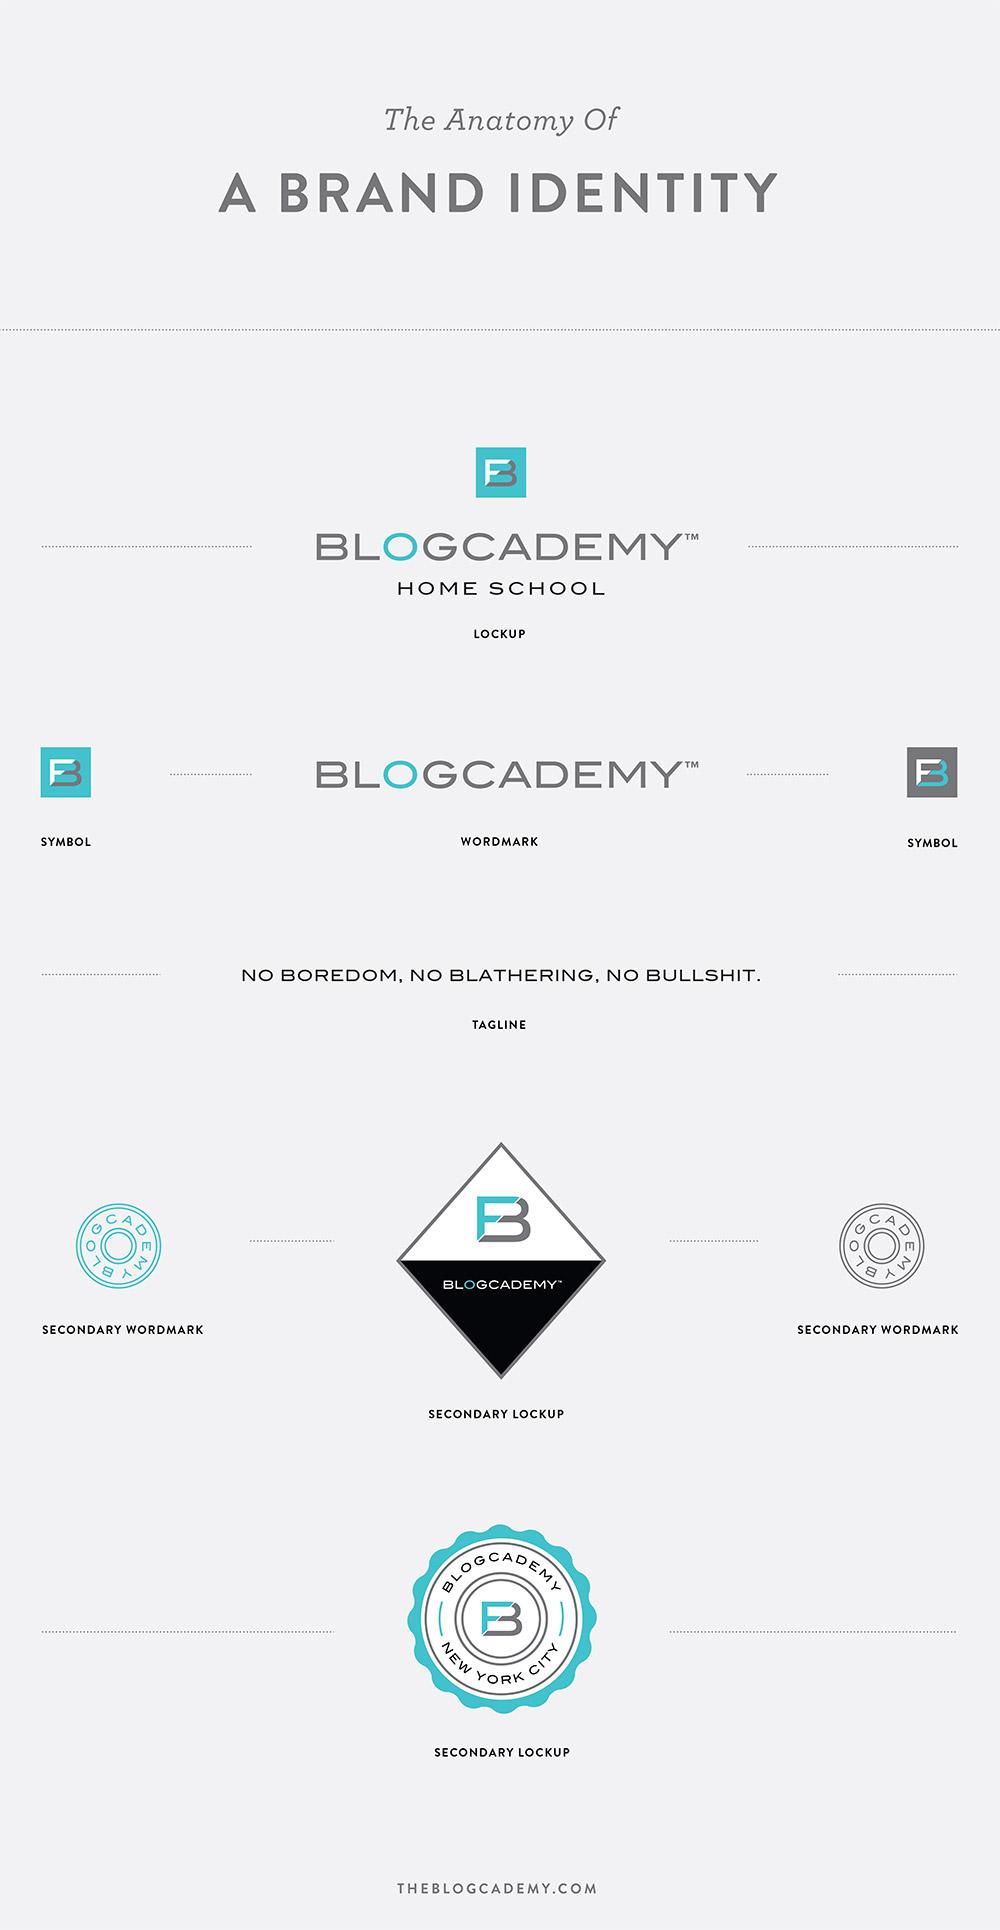 Branch | The Anatomy of A Brand Identity